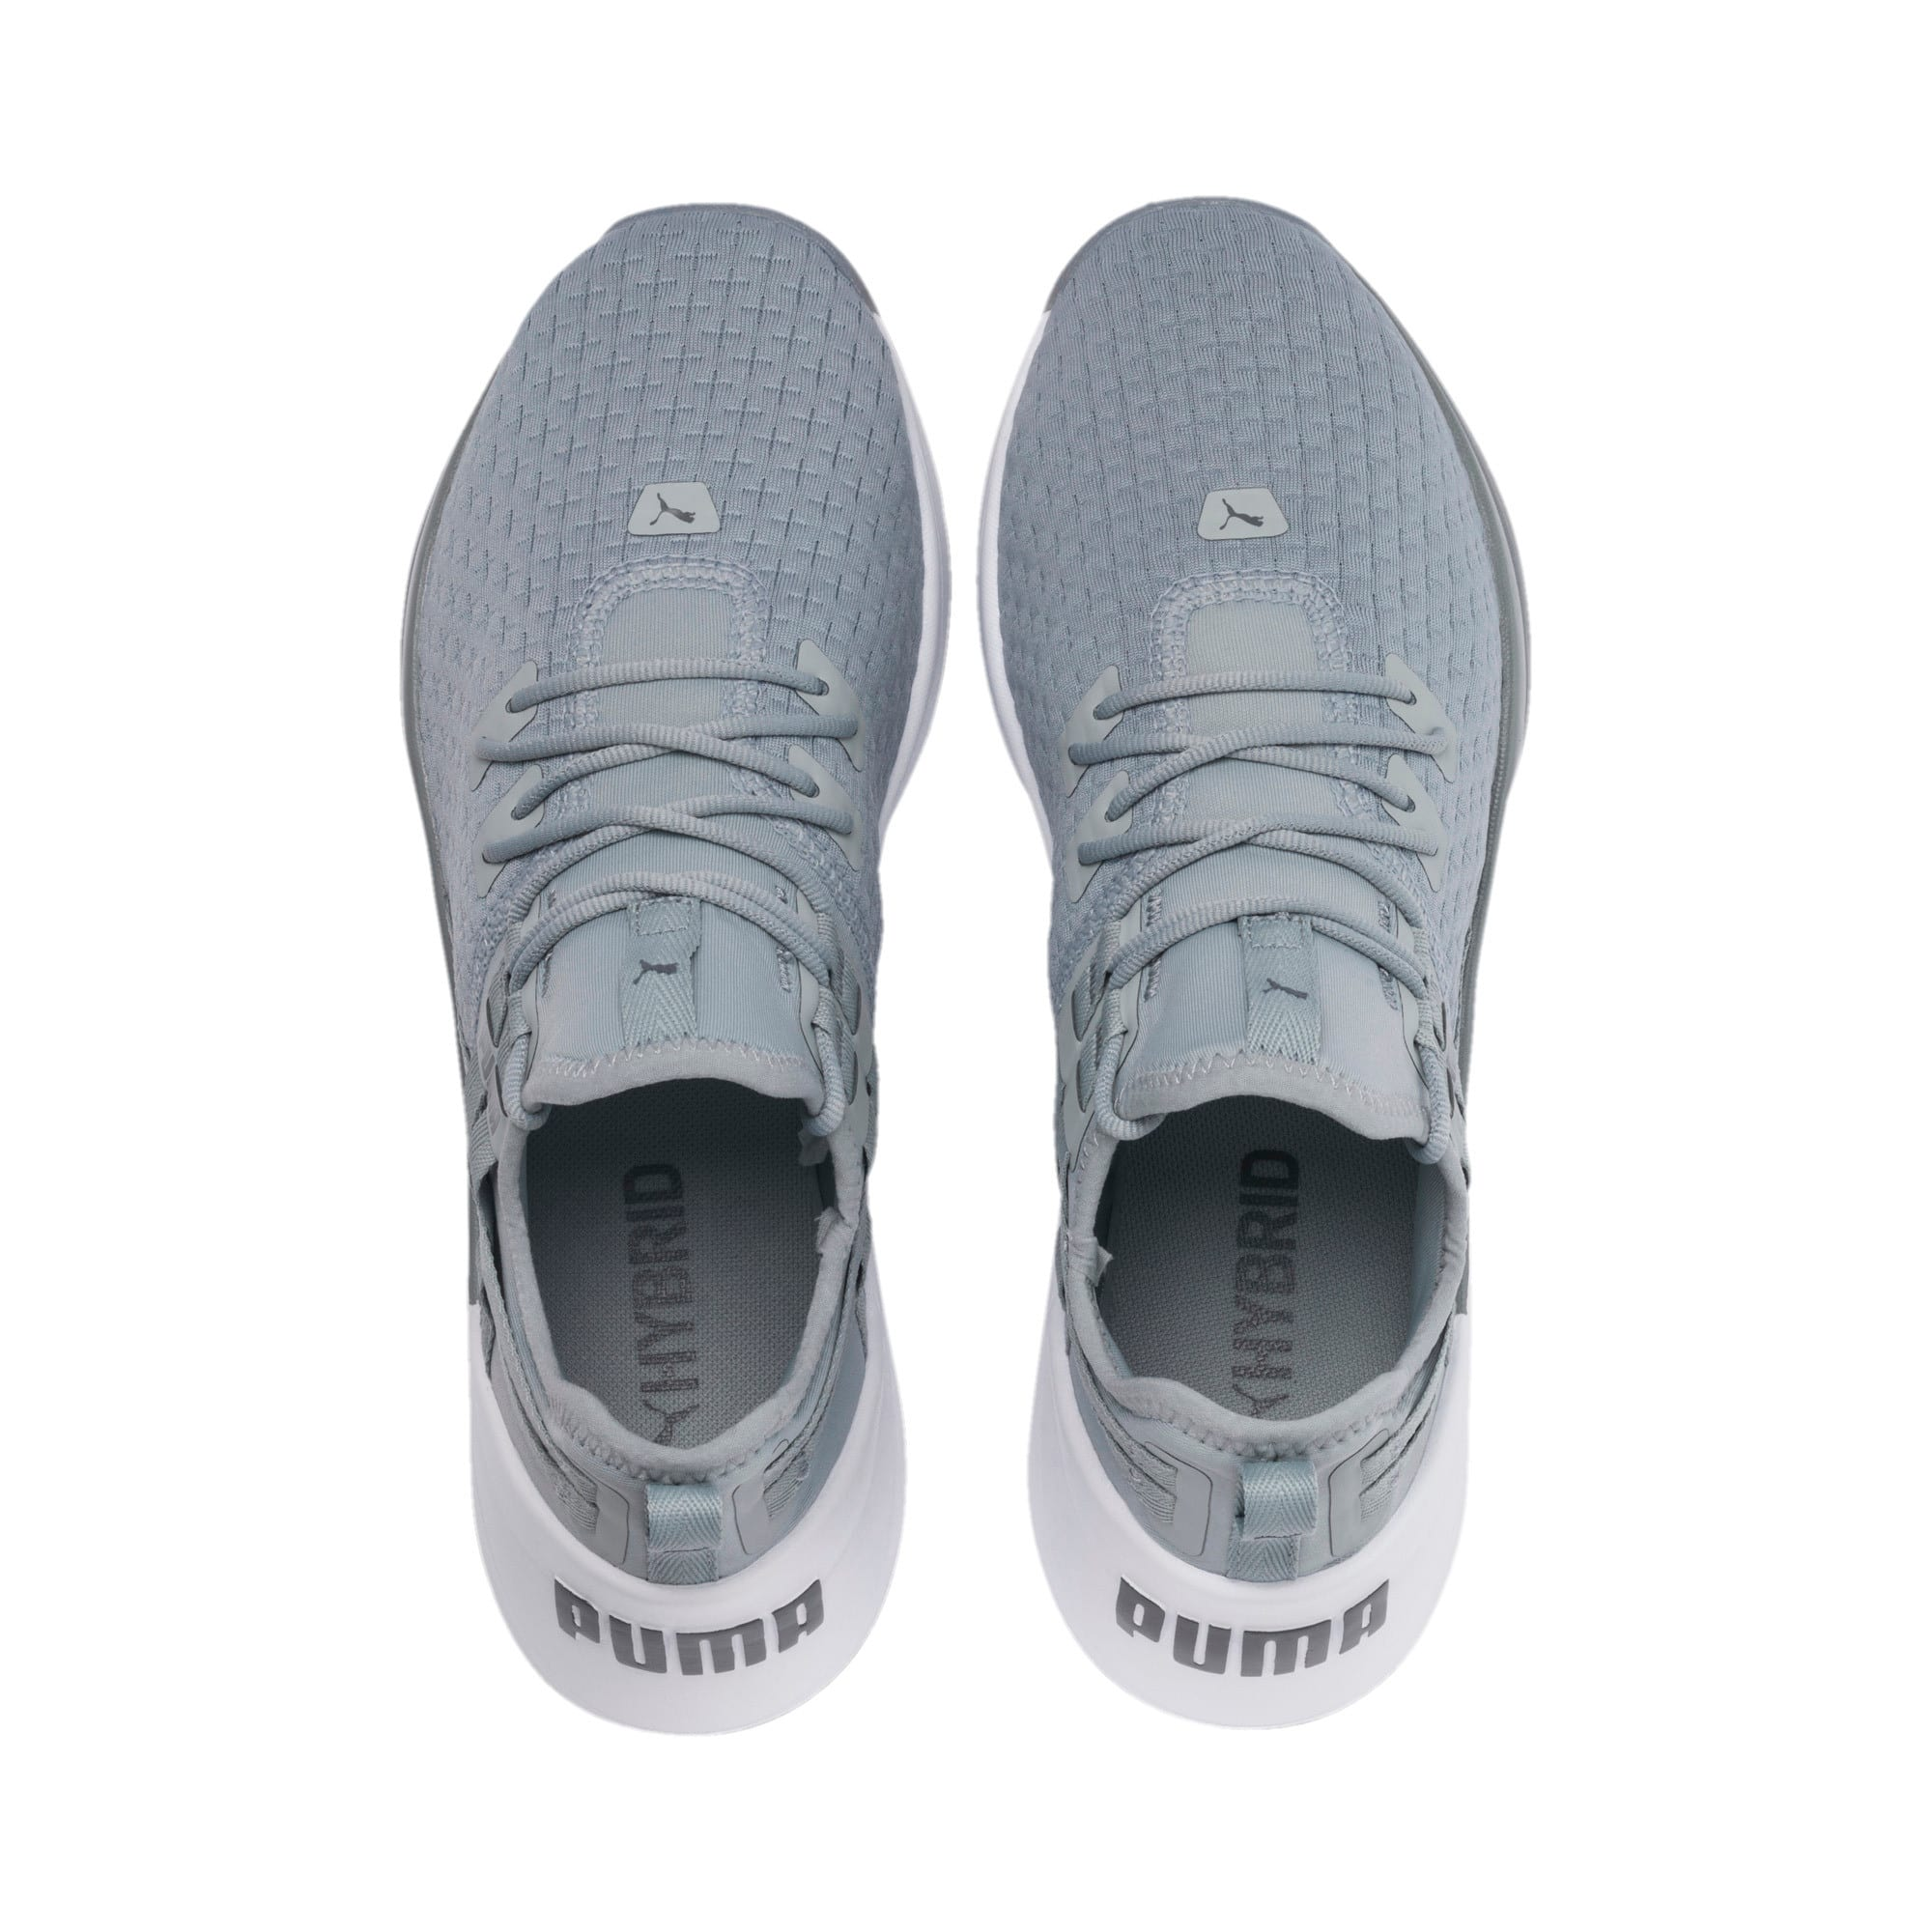 Thumbnail 6 of Jaab XT Women's Training Shoes, Quarry-Puma White, medium